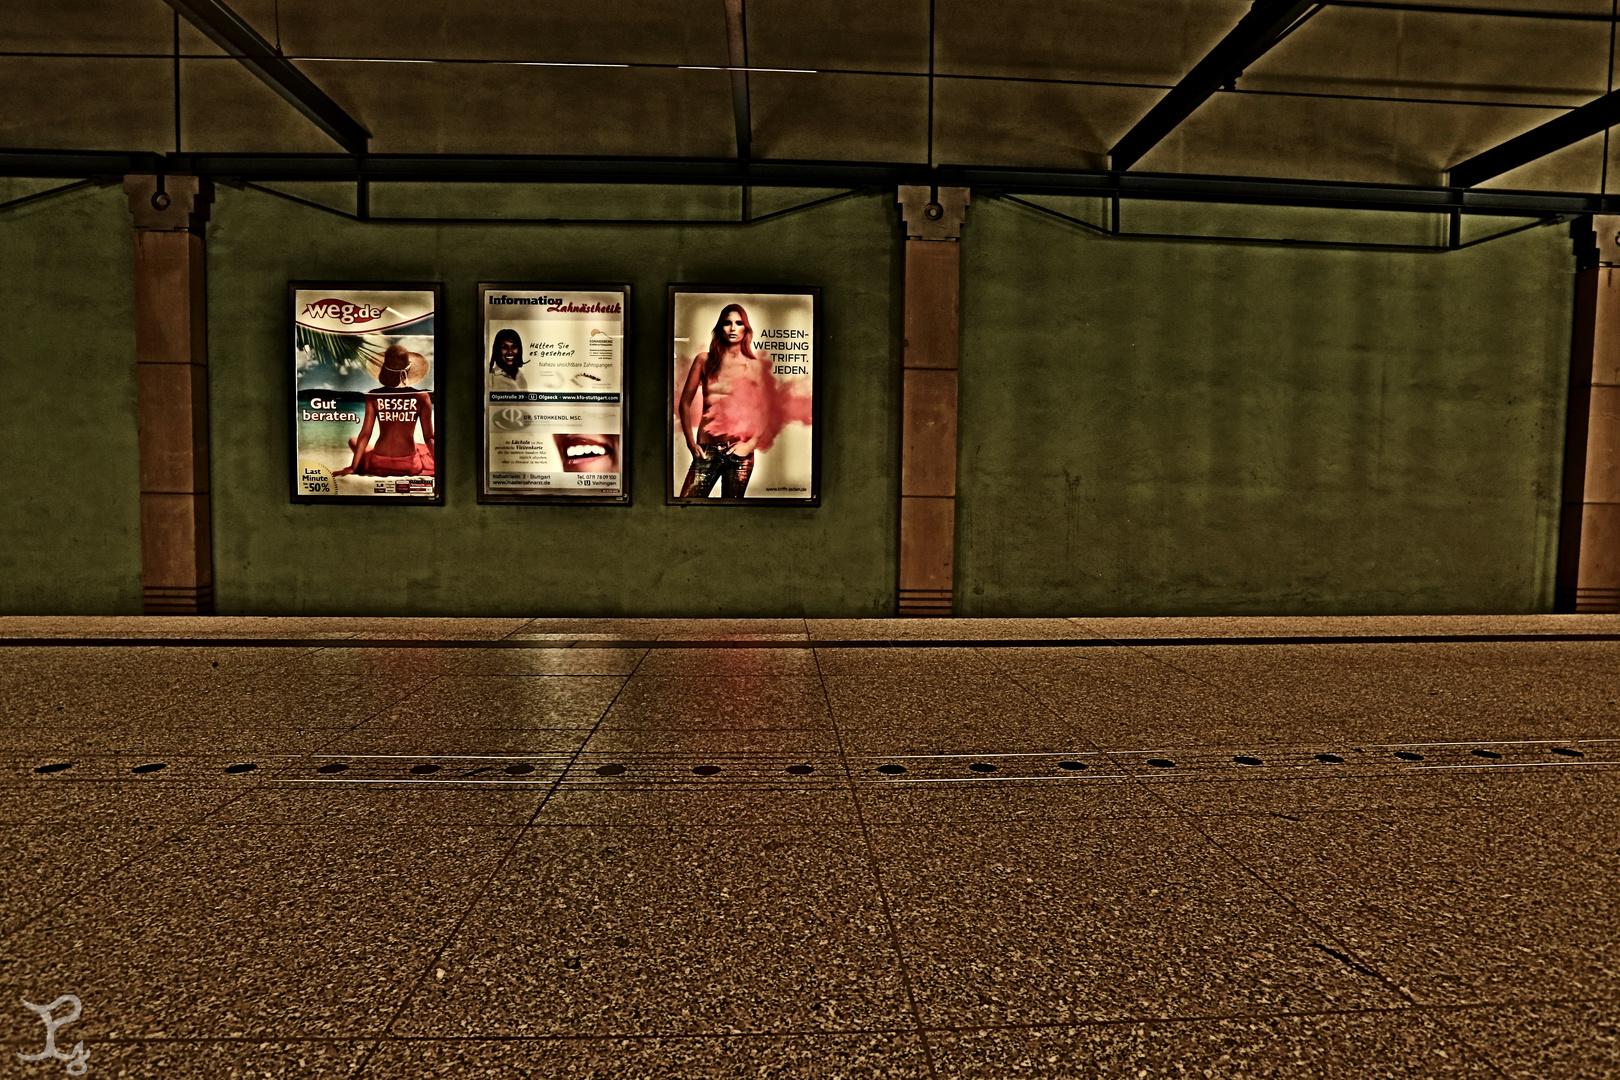 Stuttgart U-Bahn